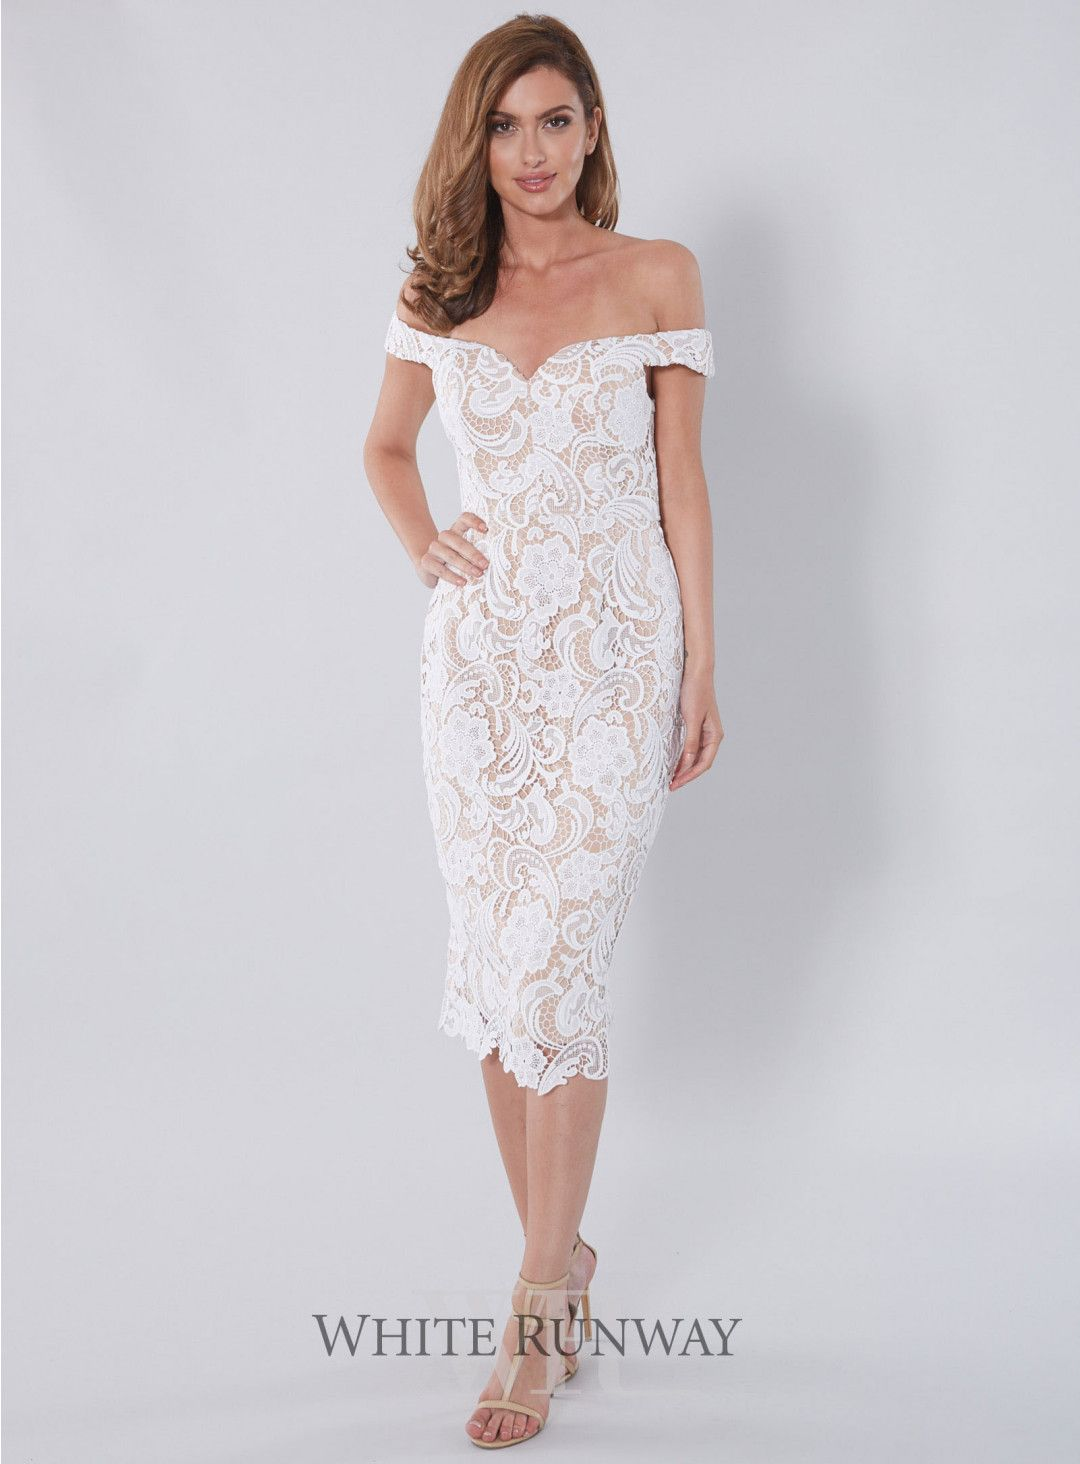 Stella Dress Stunning Lace Dress By Australian Designer Love Honor A Flattering Midi Dress With A Sw White Bridal Shower Dress Bridal Shower Dress Lace Dress